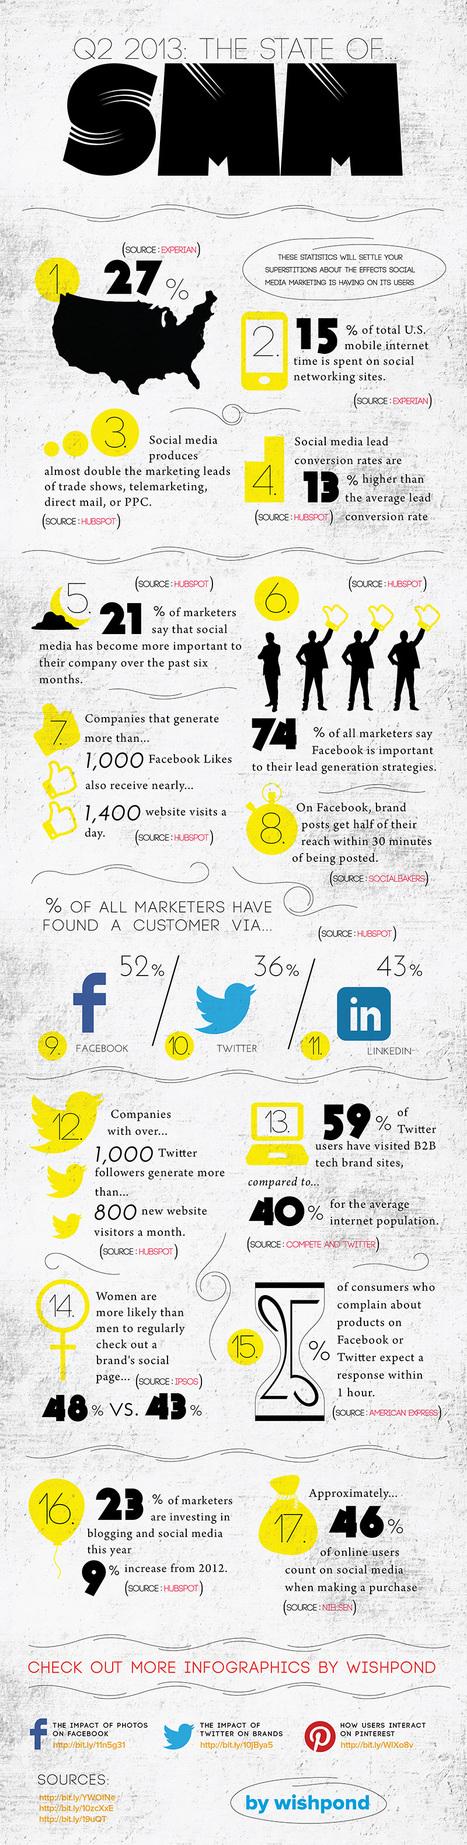 17 Incredible Social Media Marketing Statistics [INFOGRAPHIC] - AllTwitter | Personal Branding and Professional networks - @Socialfave @TheMisterFavor @TOOLS_BOX_DEV @TOOLS_BOX_EUR @P_TREBAUL @DNAMktg @DNADatas @BRETAGNE_CHARME @TOOLS_BOX_IND @TOOLS_BOX_ITA @TOOLS_BOX_UK @TOOLS_BOX_ESP @TOOLS_BOX_GER @TOOLS_BOX_DEV @TOOLS_BOX_BRA | Scoop.it